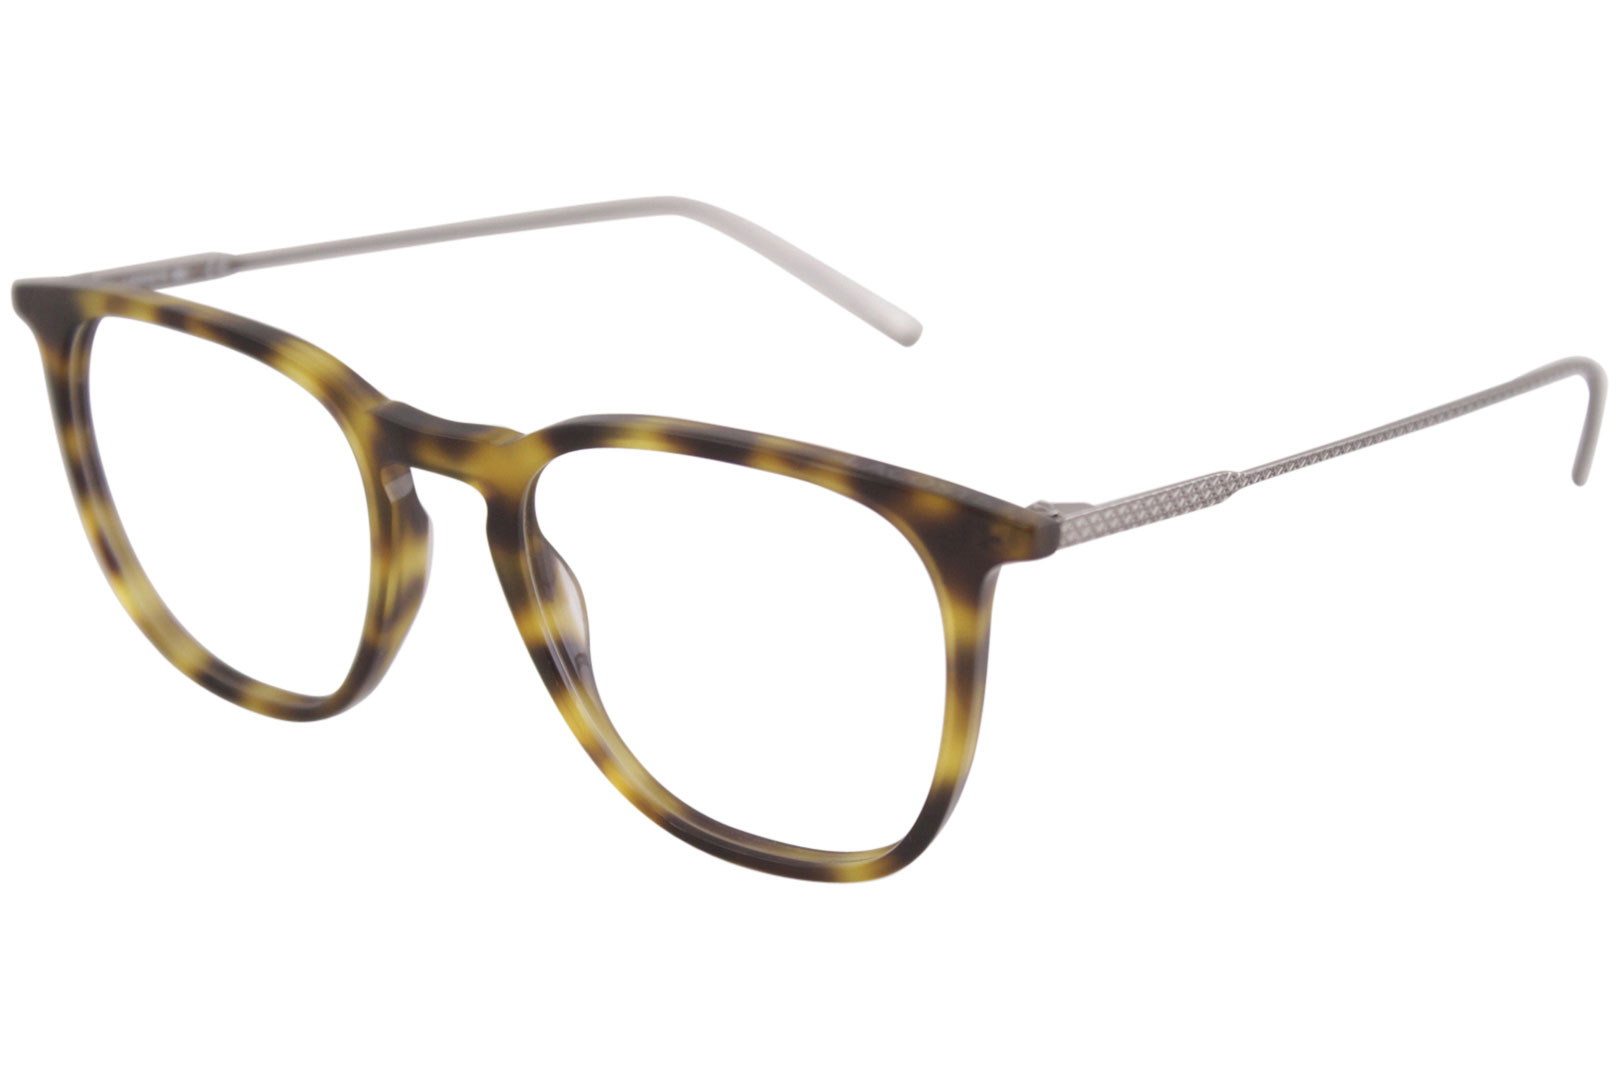 918569ad784 Lacoste Eyeglasses L2828 L 2828 218 Blonde Havana Full Rim Optical ...